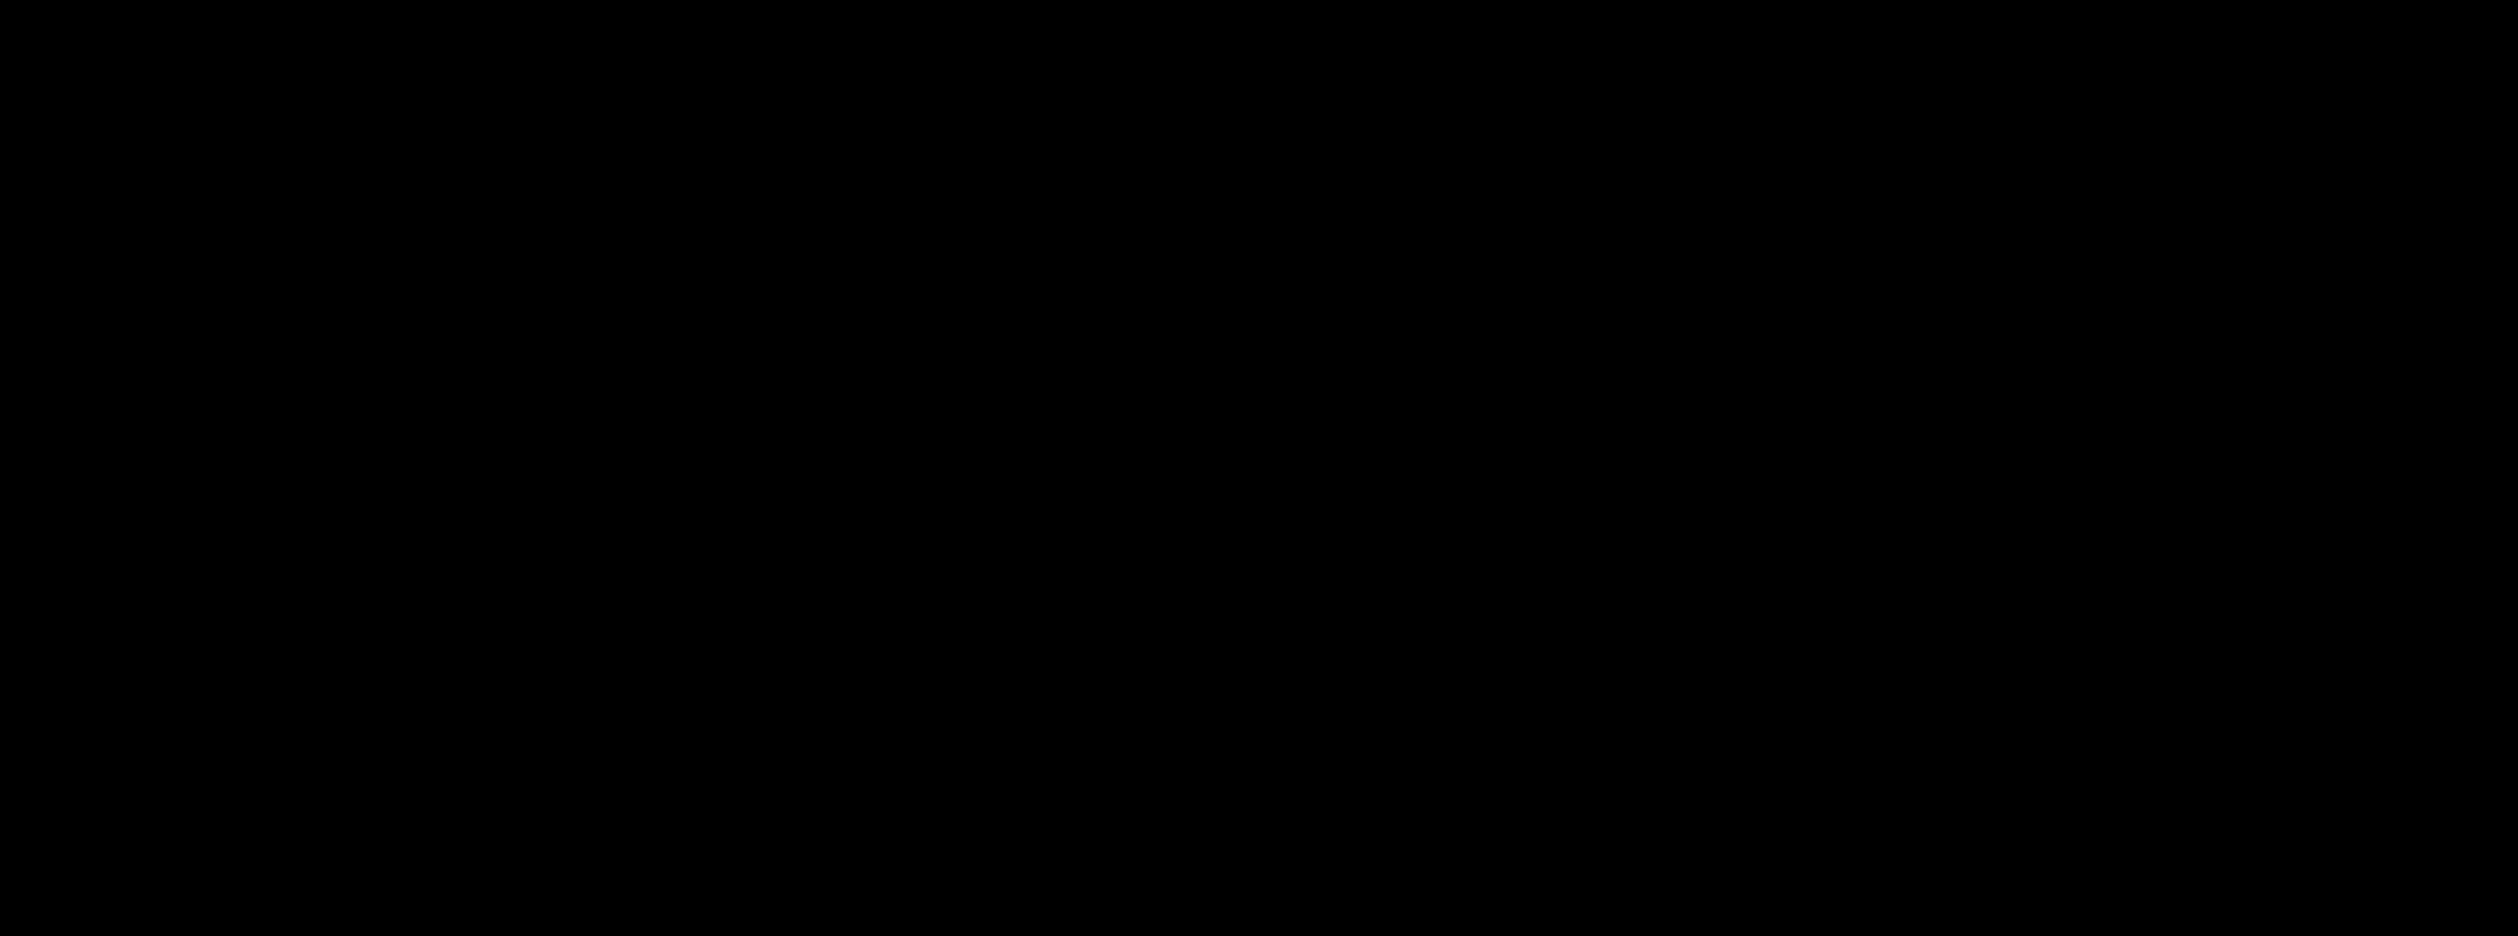 dzintars-family-logotype